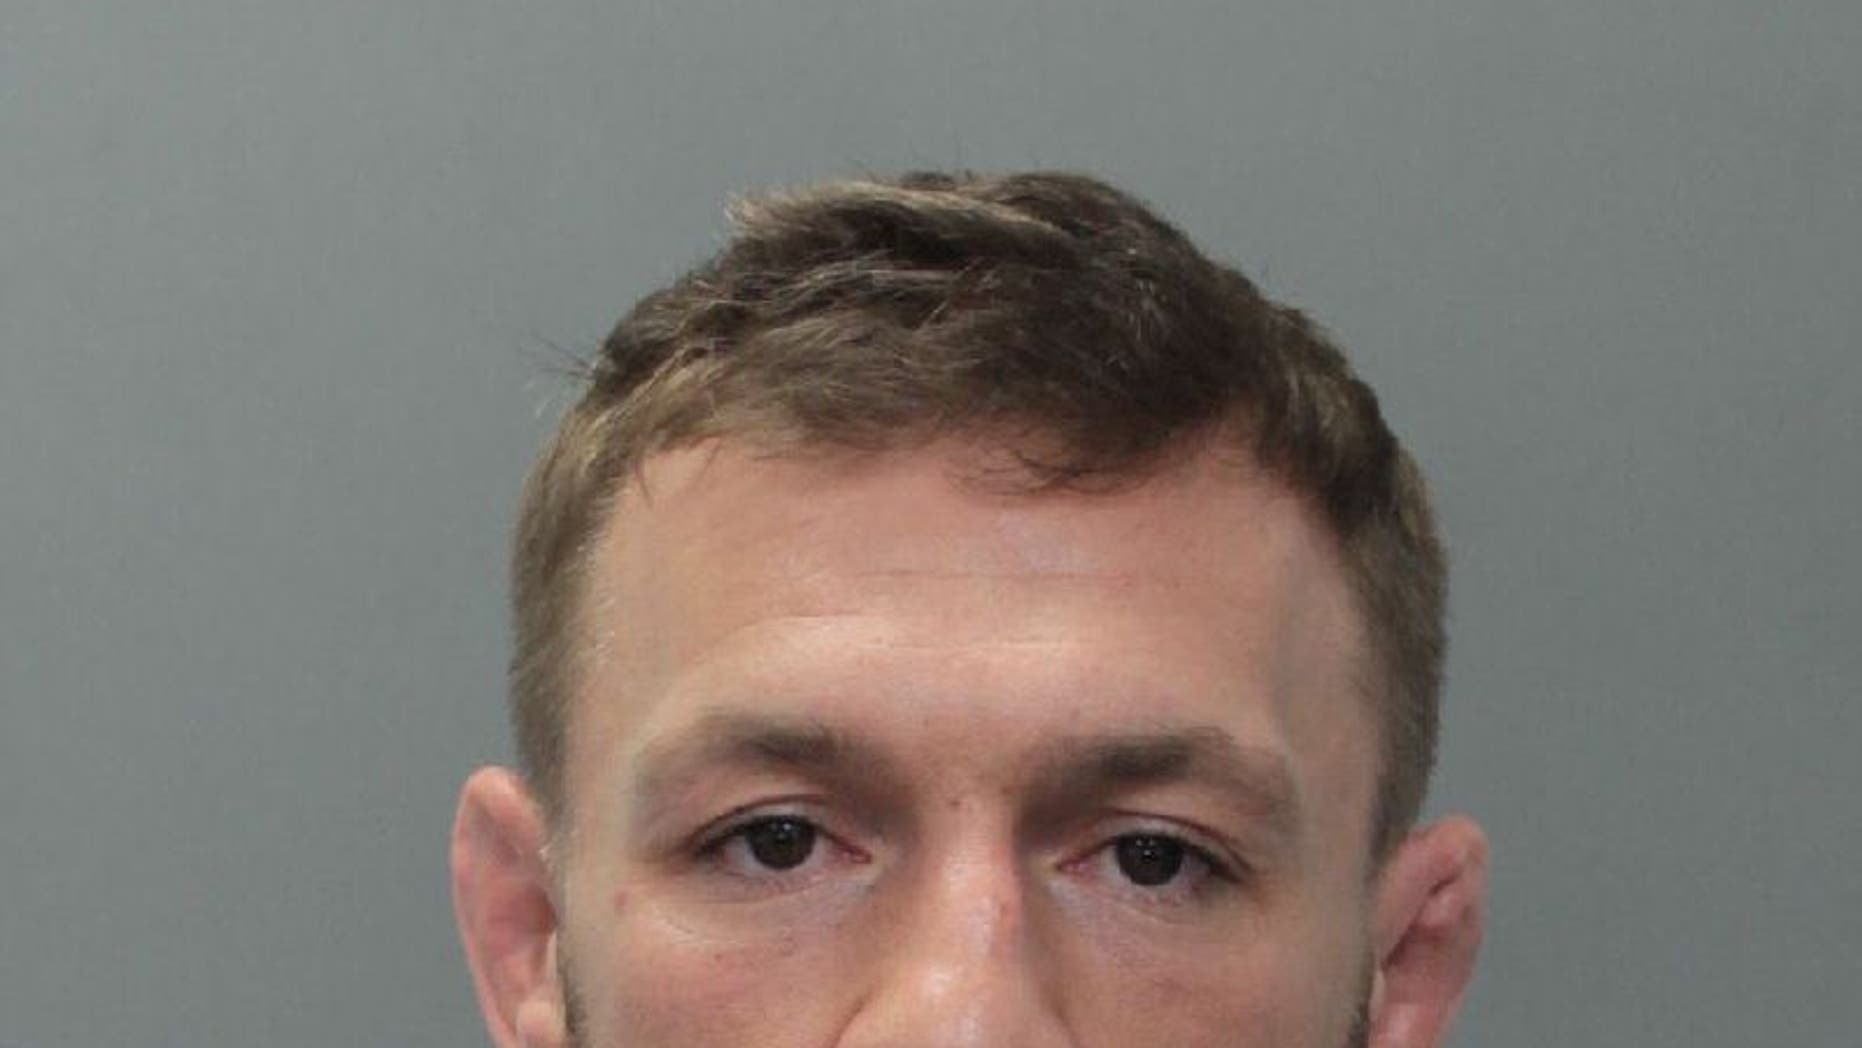 UFC star Conor McGregor arrested in south Florida